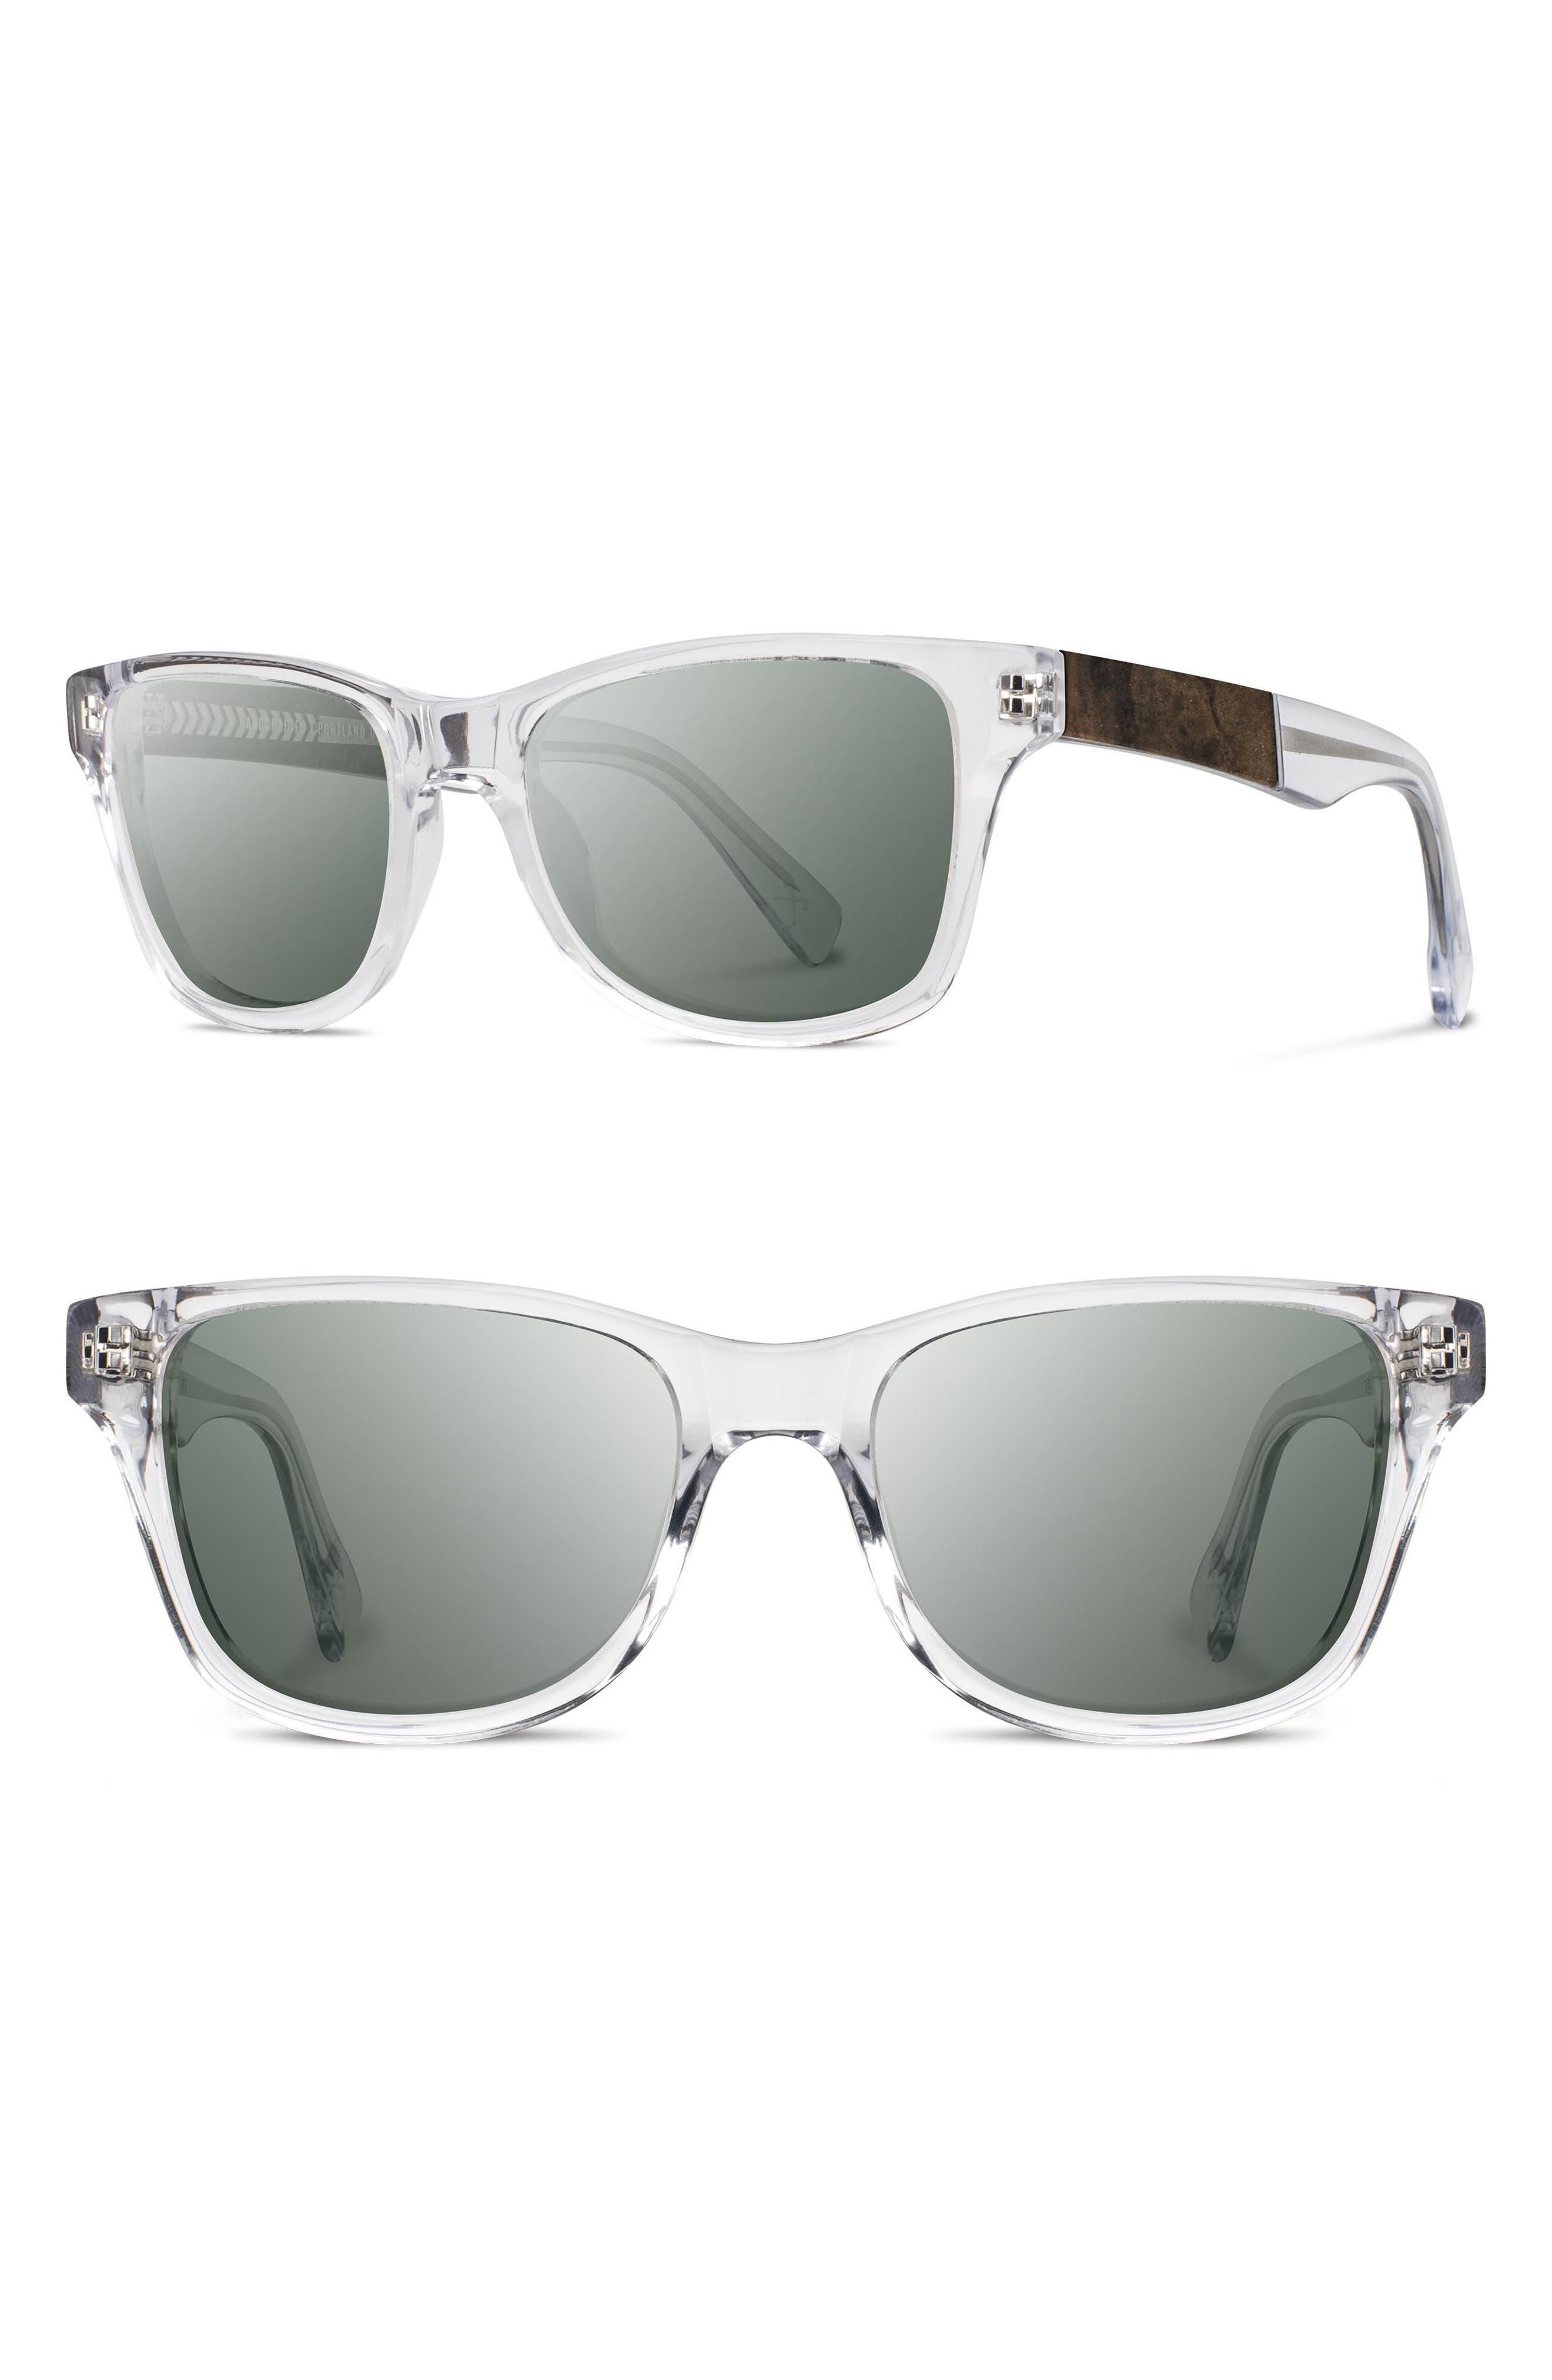 Alternate Image 1 Selected - Shwood 'Canby' 53mm Polarized Sunglasses